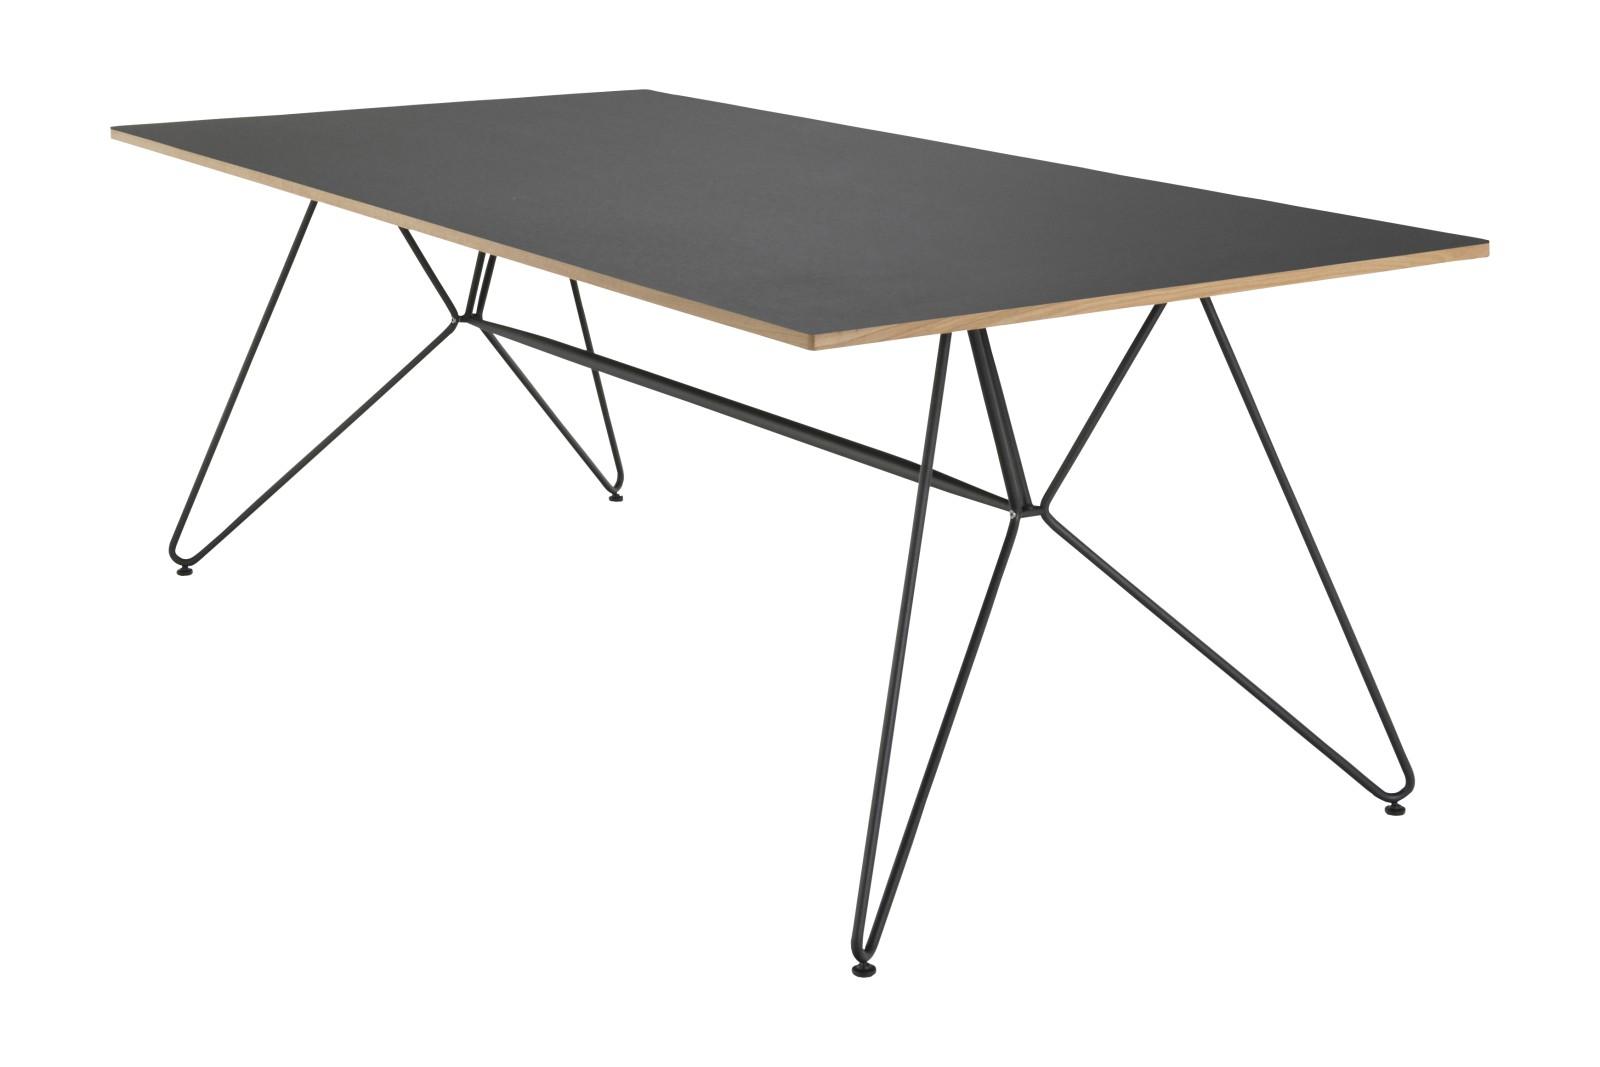 Sketch Dining Table - Indoor 208cm